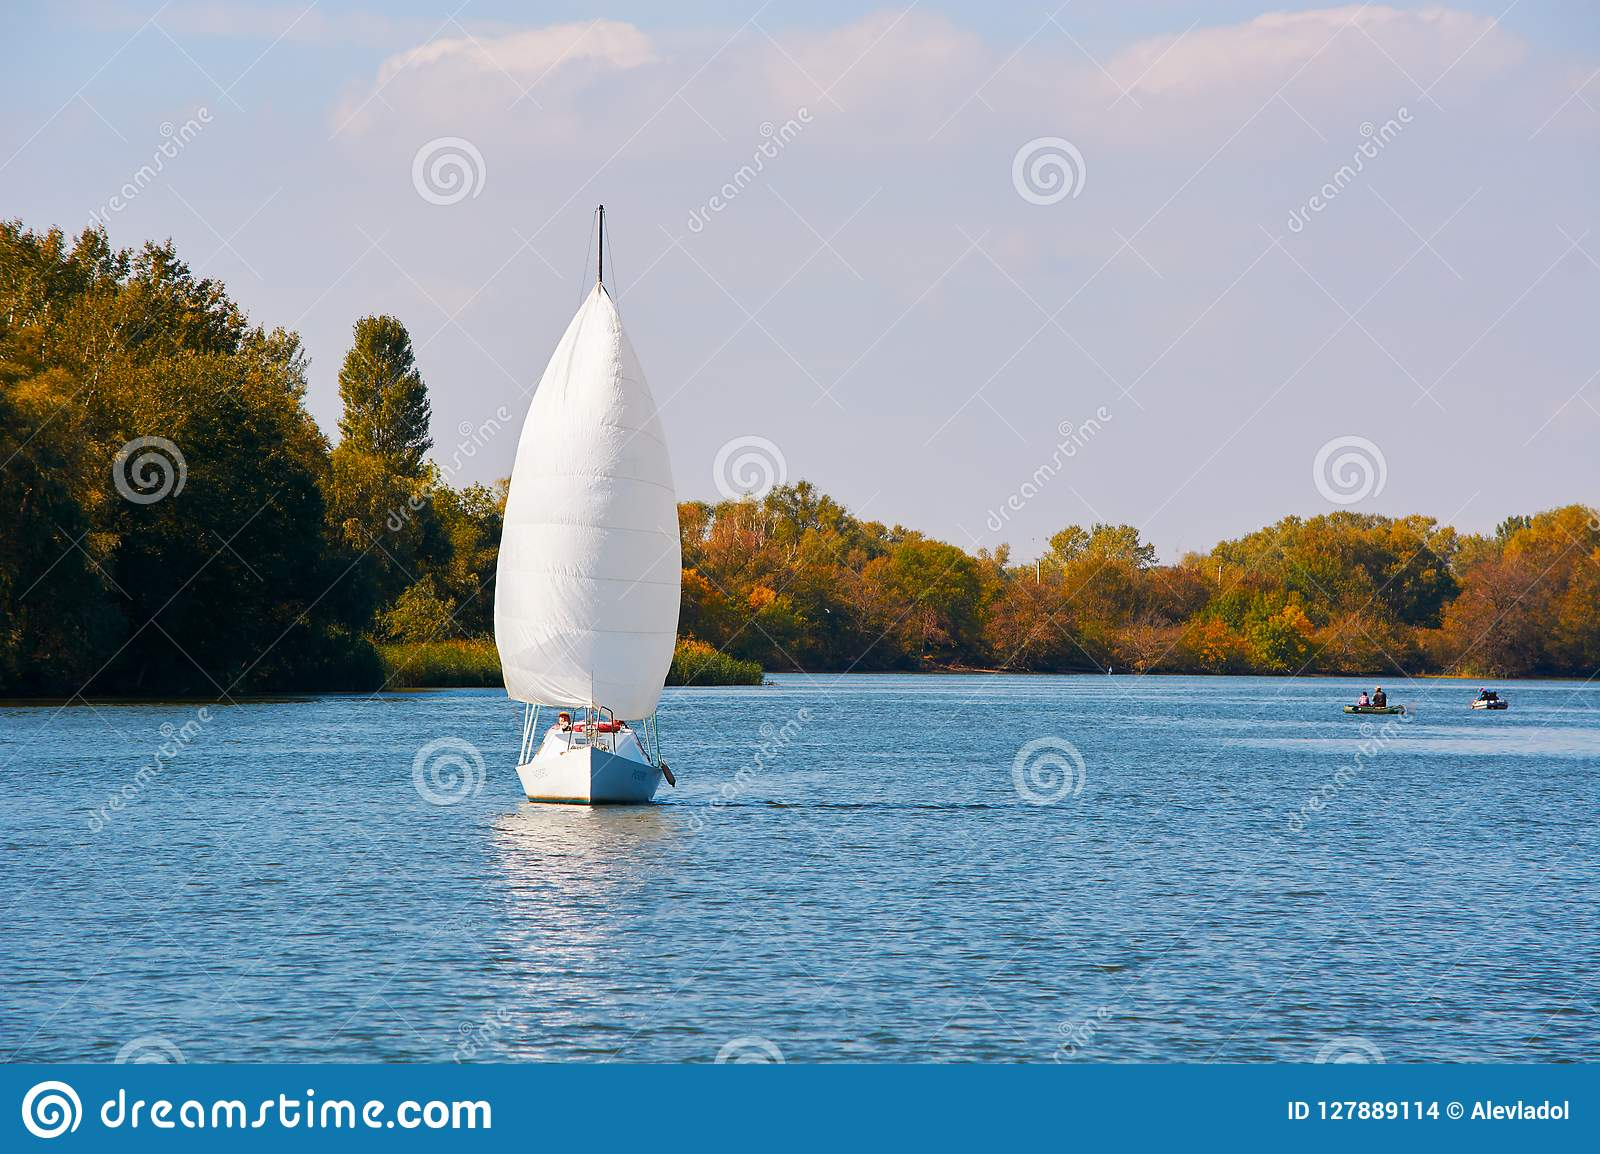 Yacht under the white sail